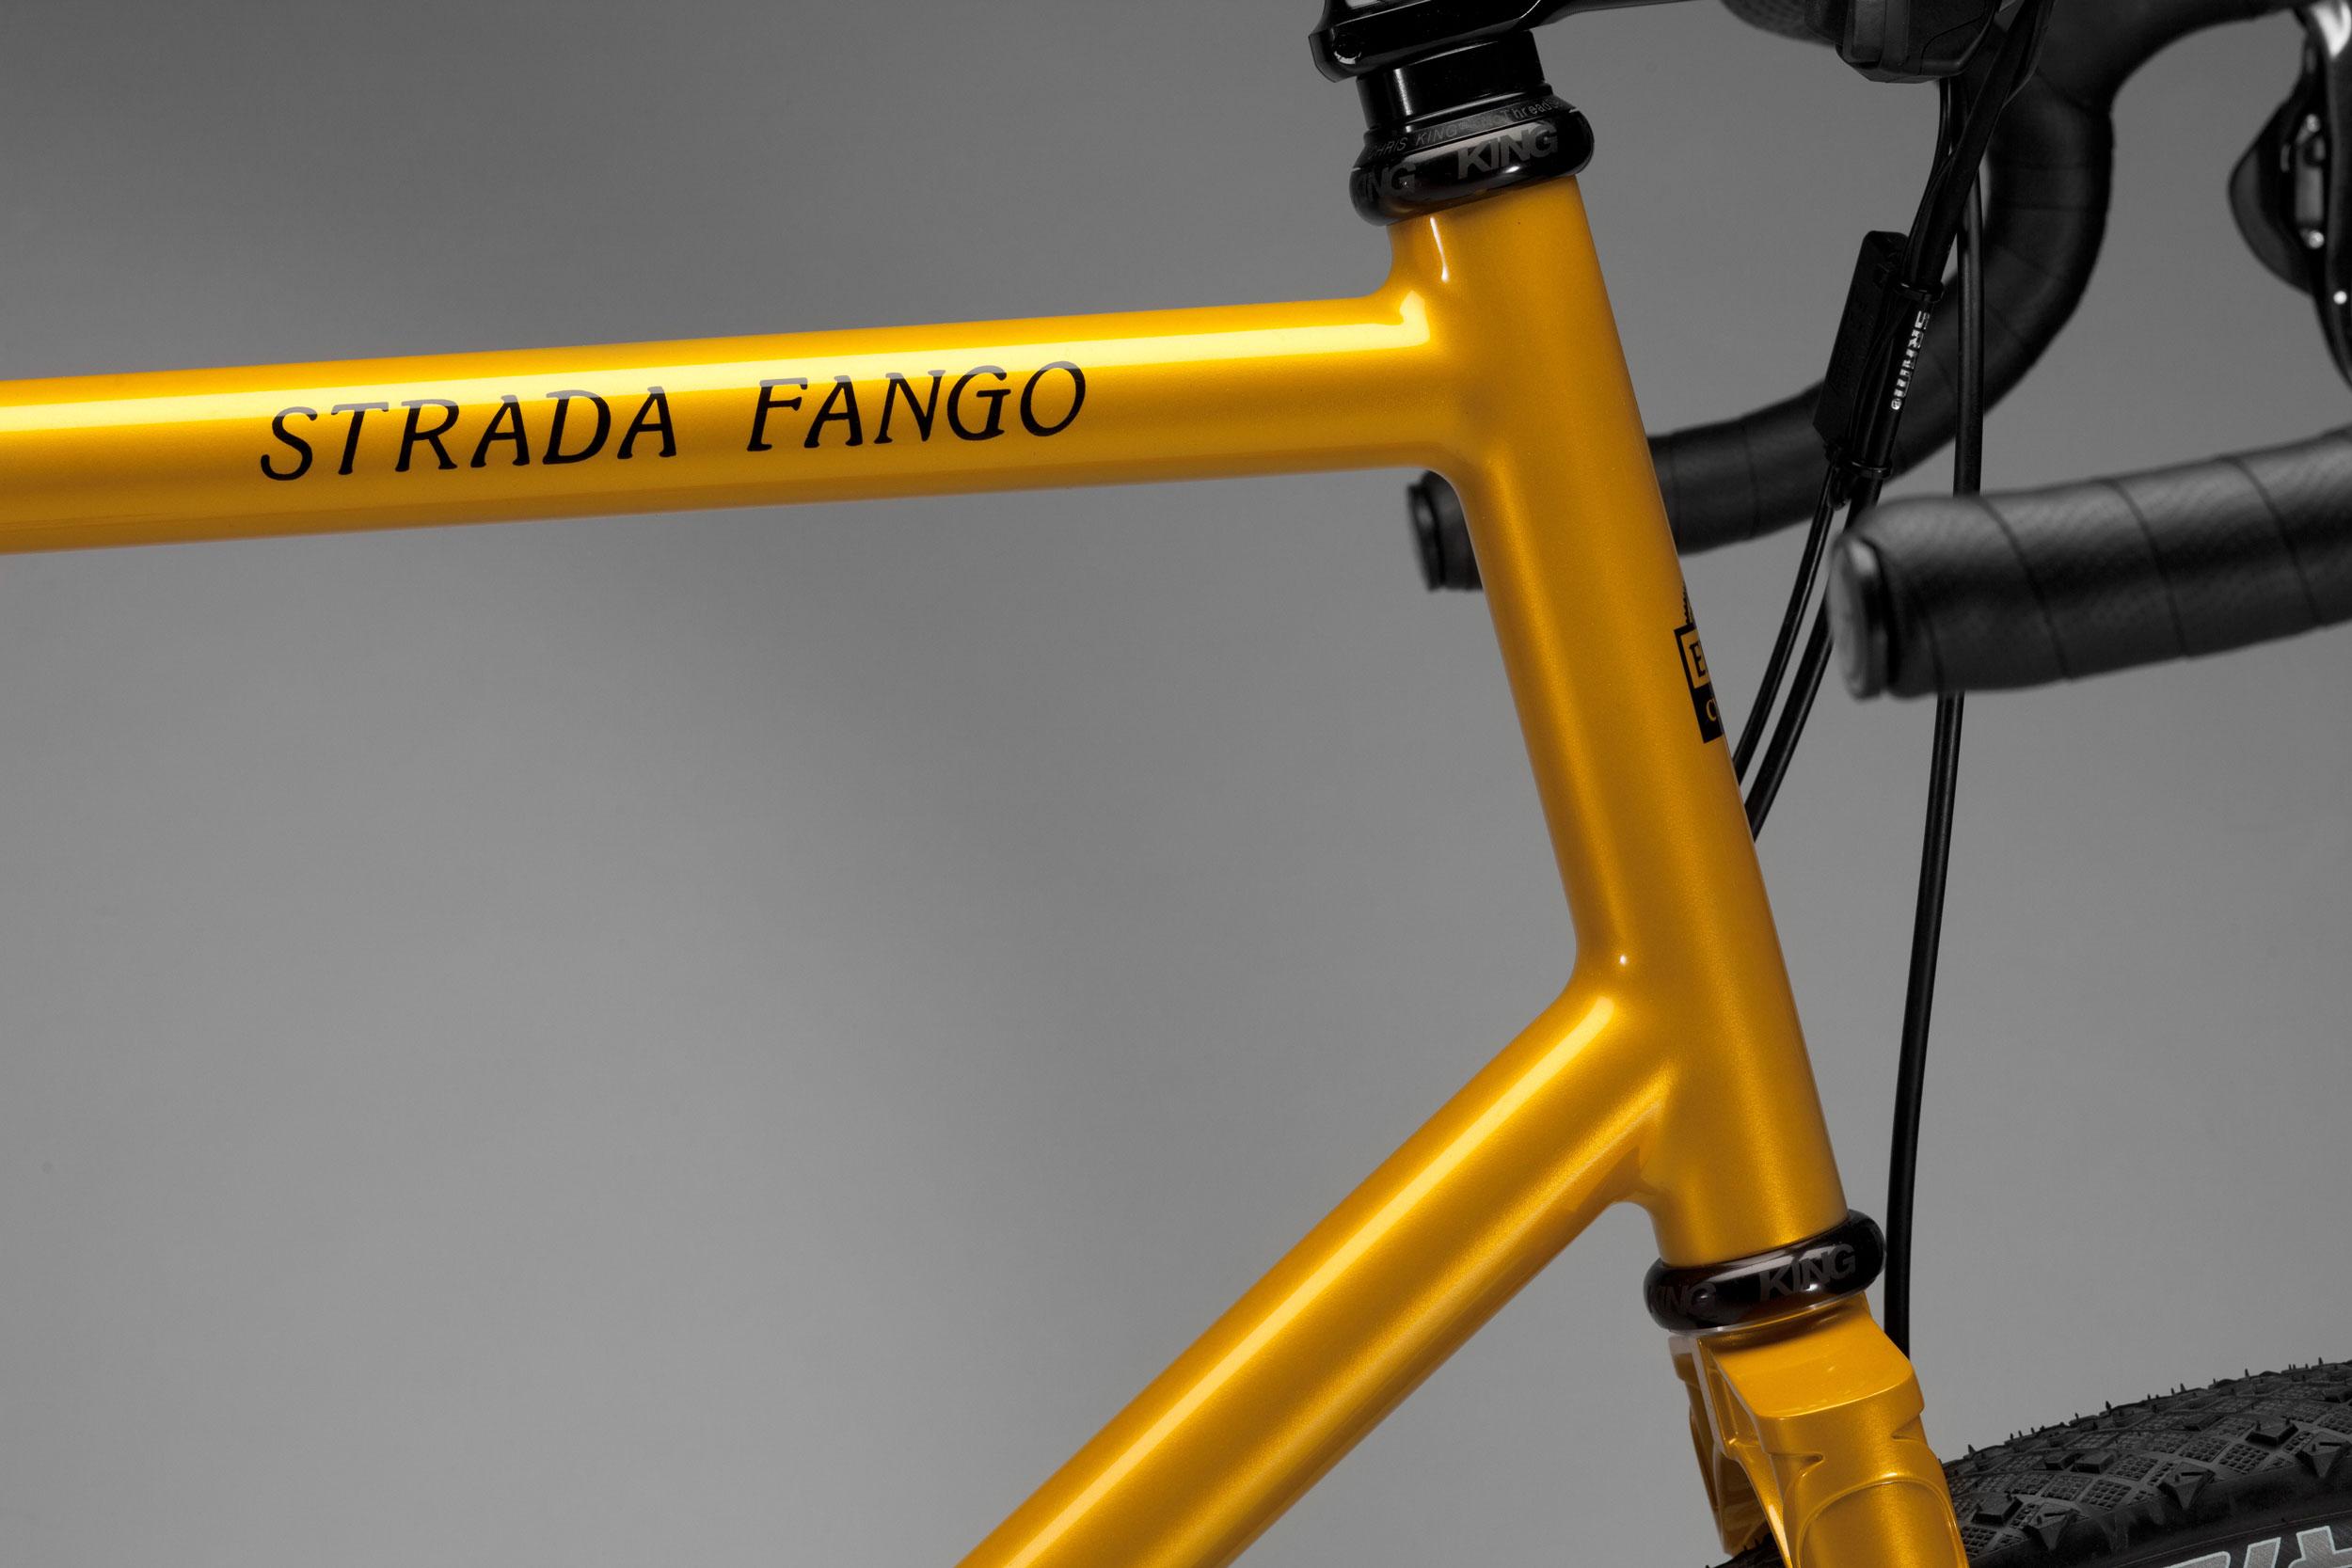 ellis-cycles-strada-fango2-2500.jpg